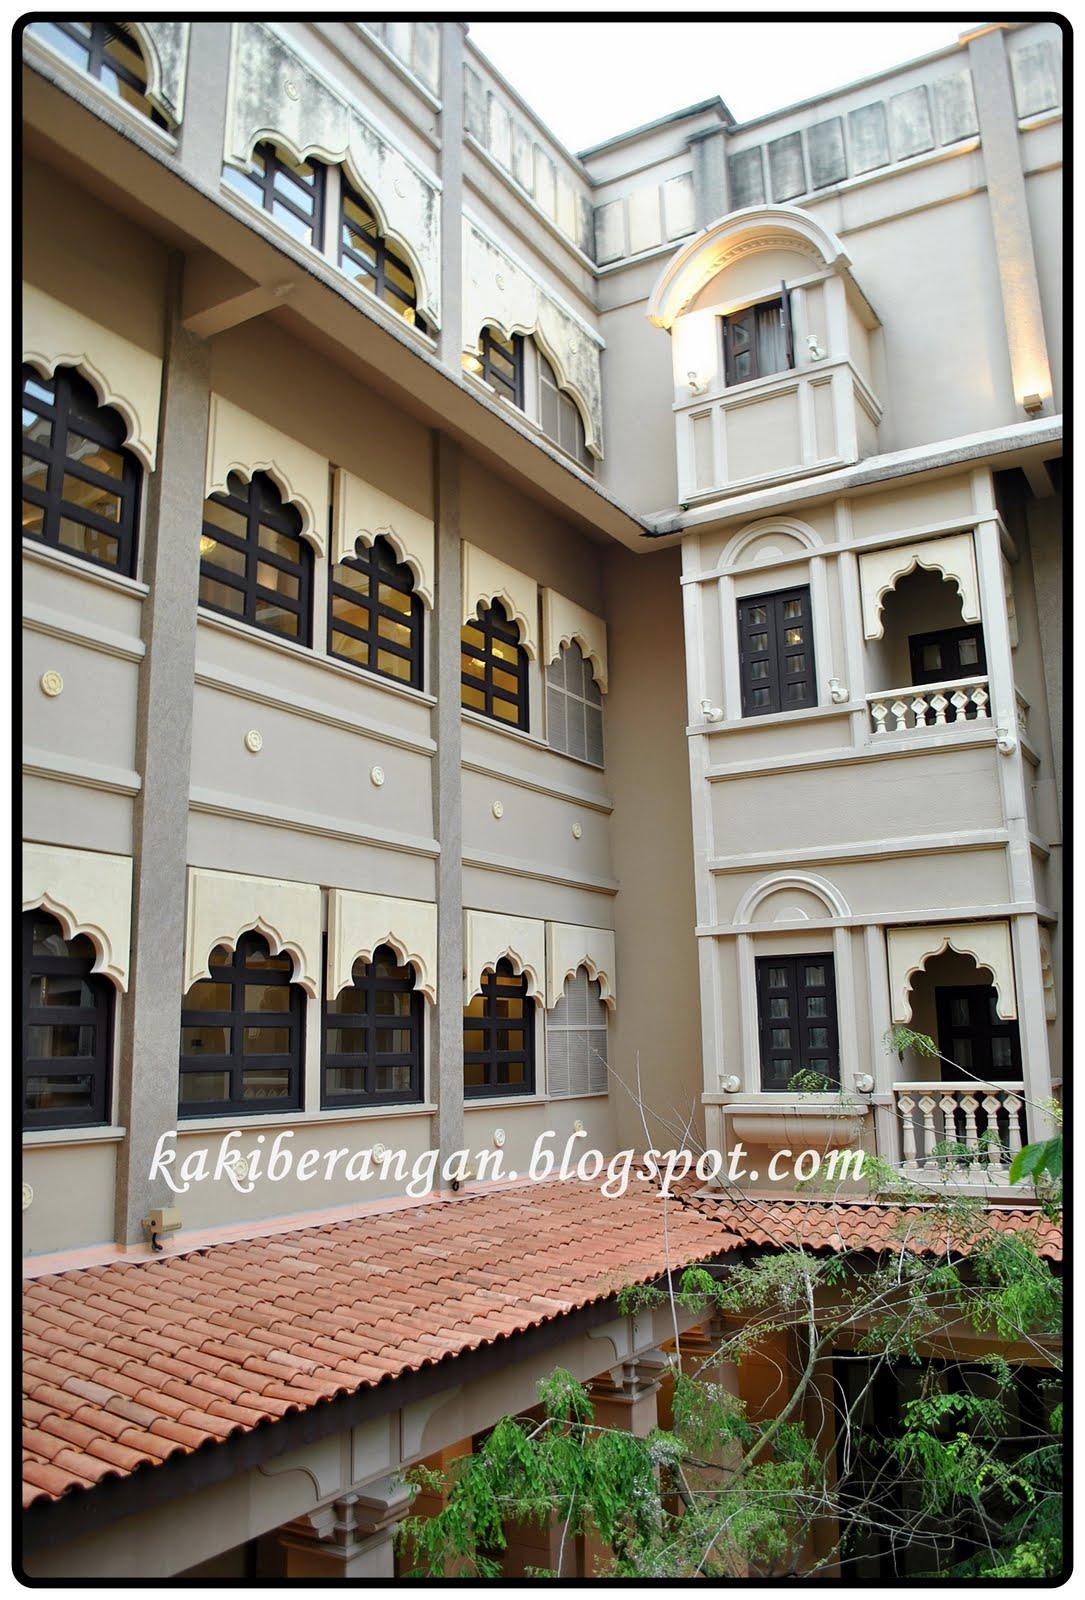 Pullman putrajaya the best hotel ever kaki berangan for The best hotel ever